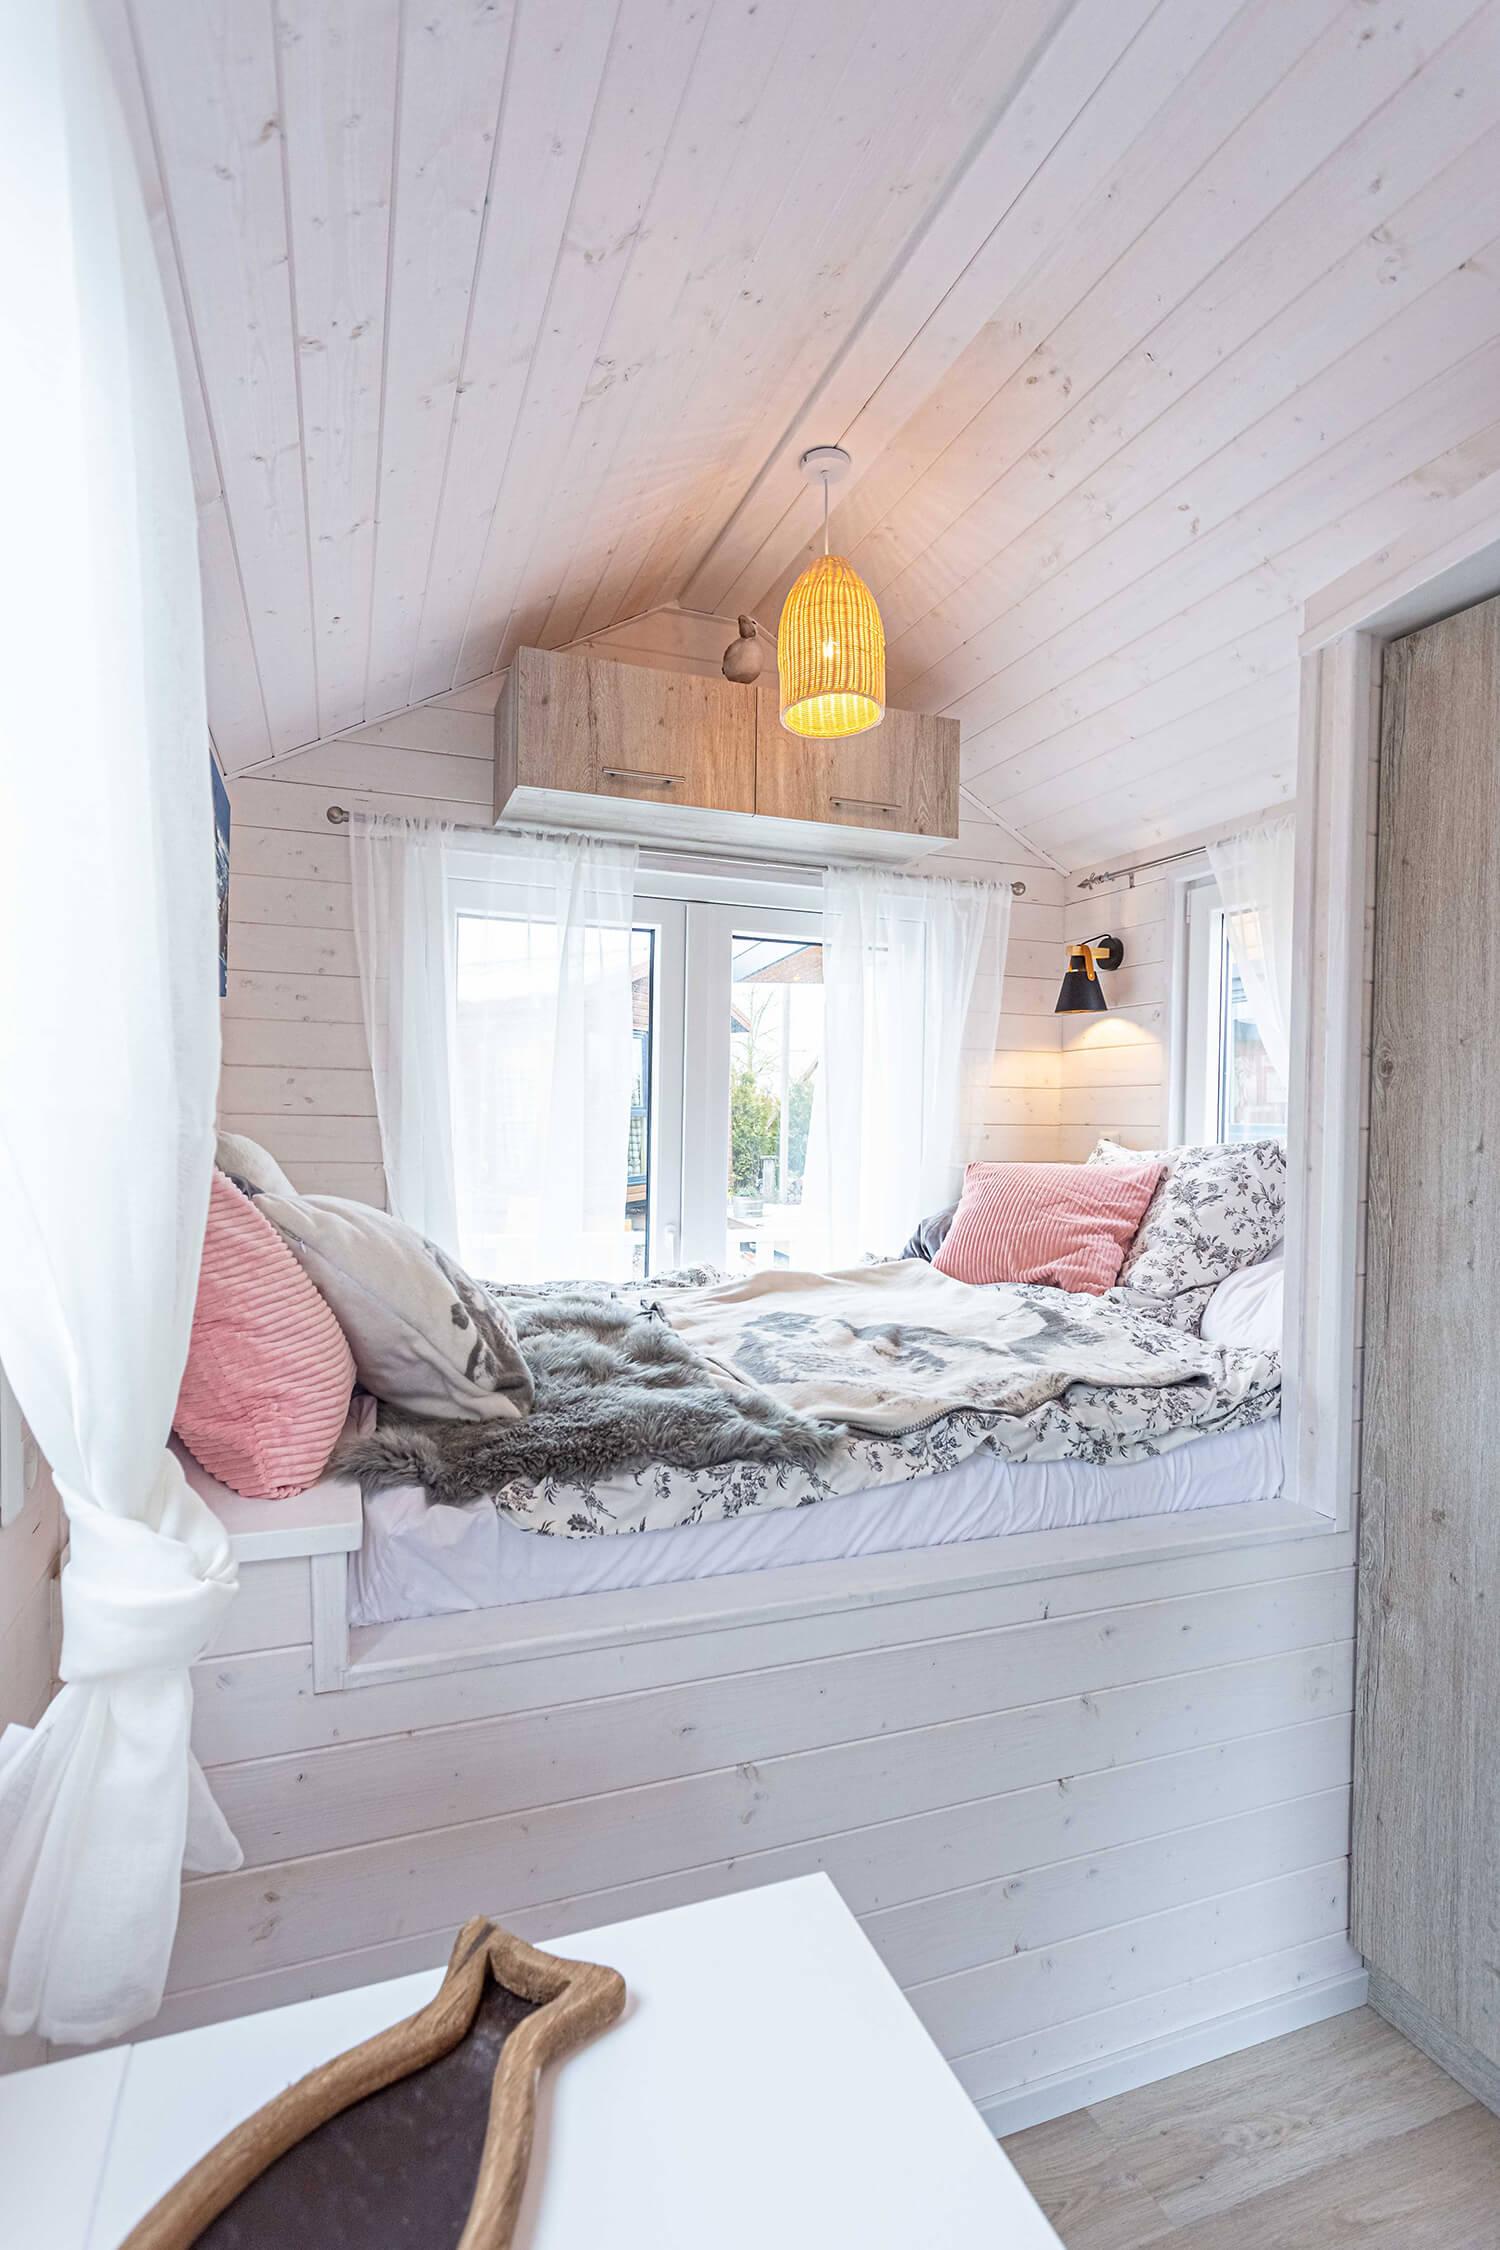 mobiles-tiny-house-kueste-vital-camp-gmbh29